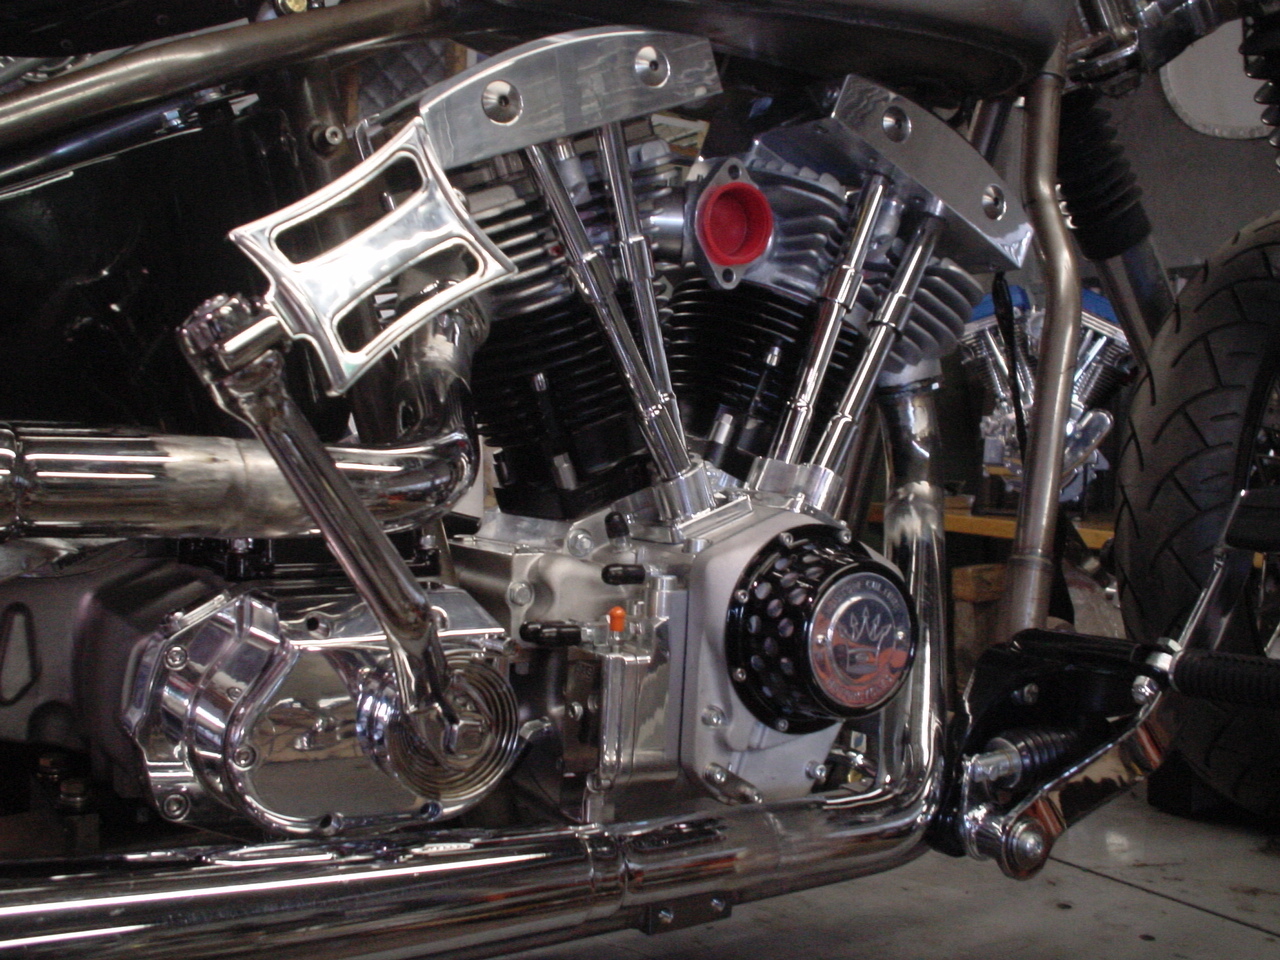 S&S Shovelhead engine, 6 Spd Kicker